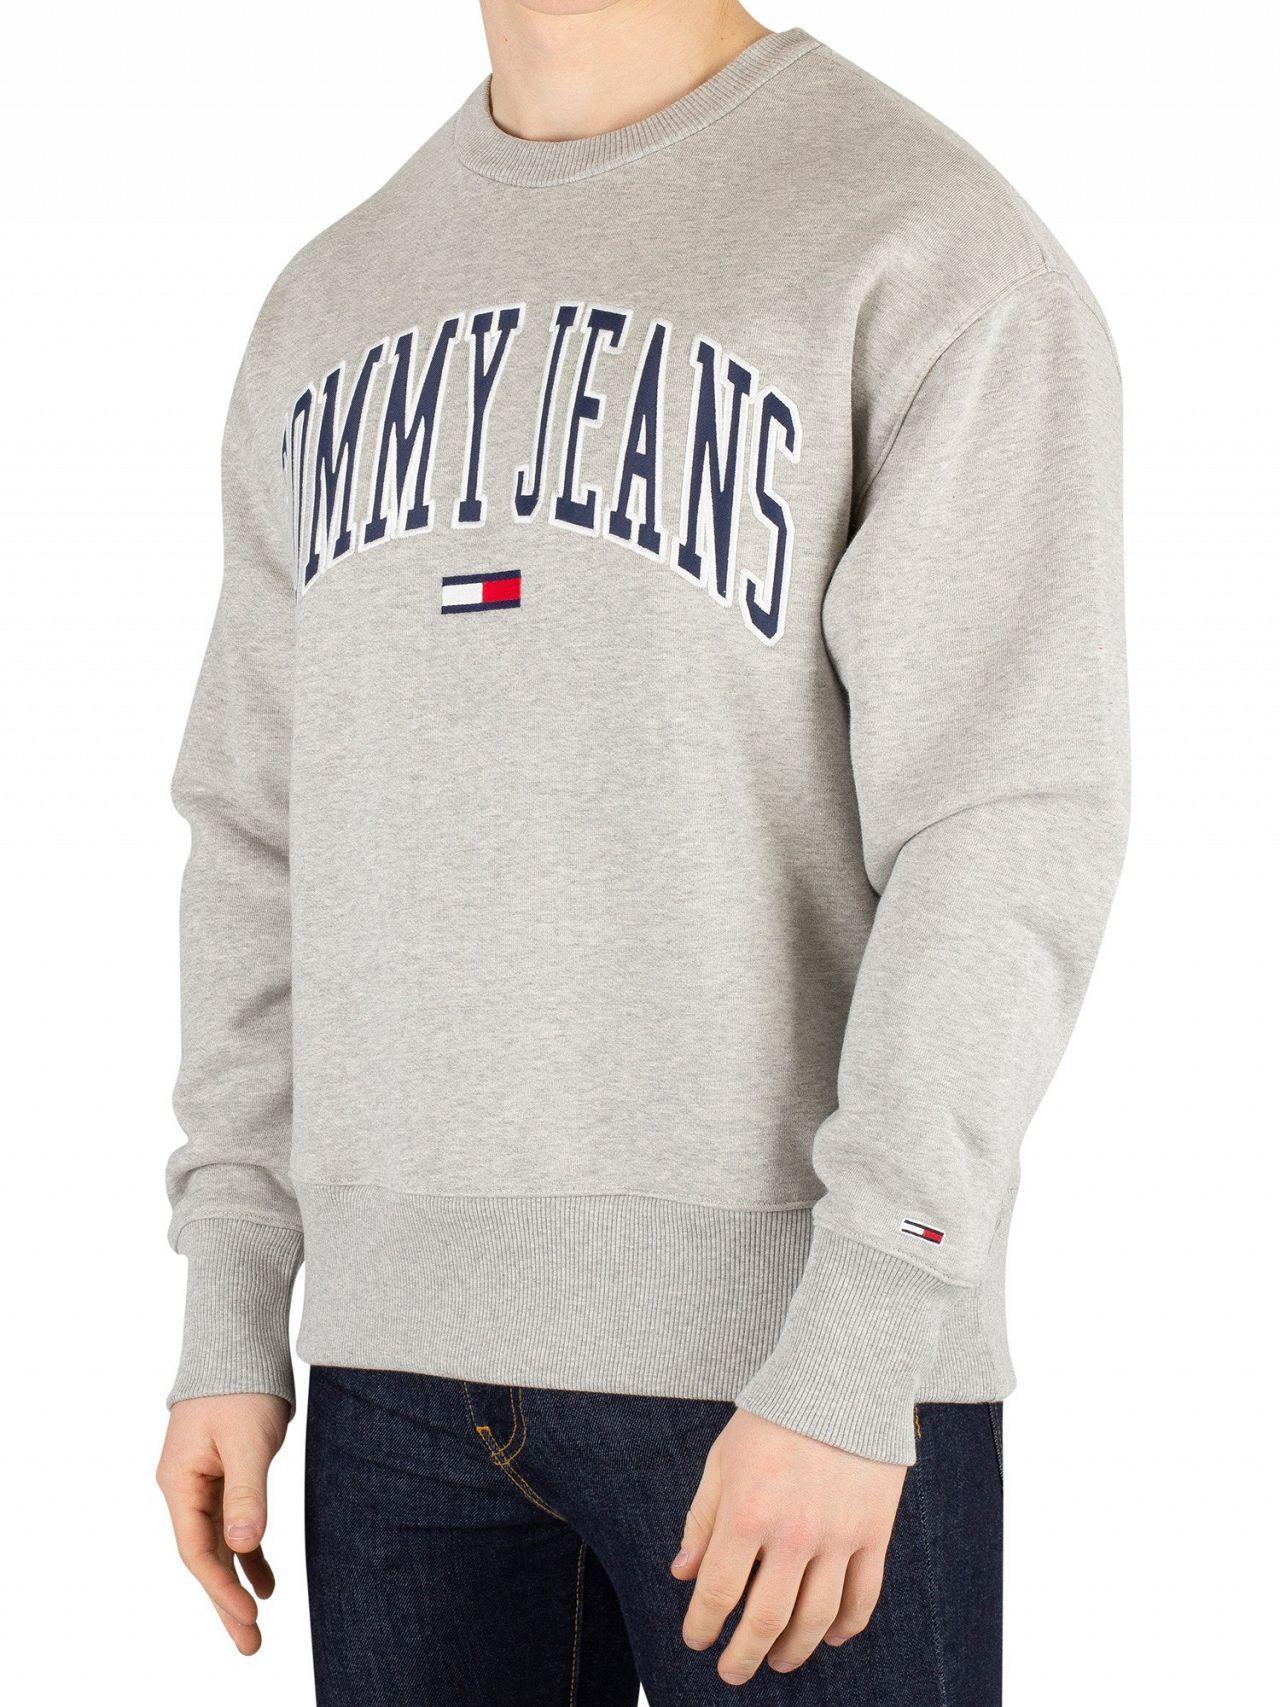 311fc265 Tommy Hilfiger. Men's Gray Light Grey Heather Clean Collegiate Sweatshirt